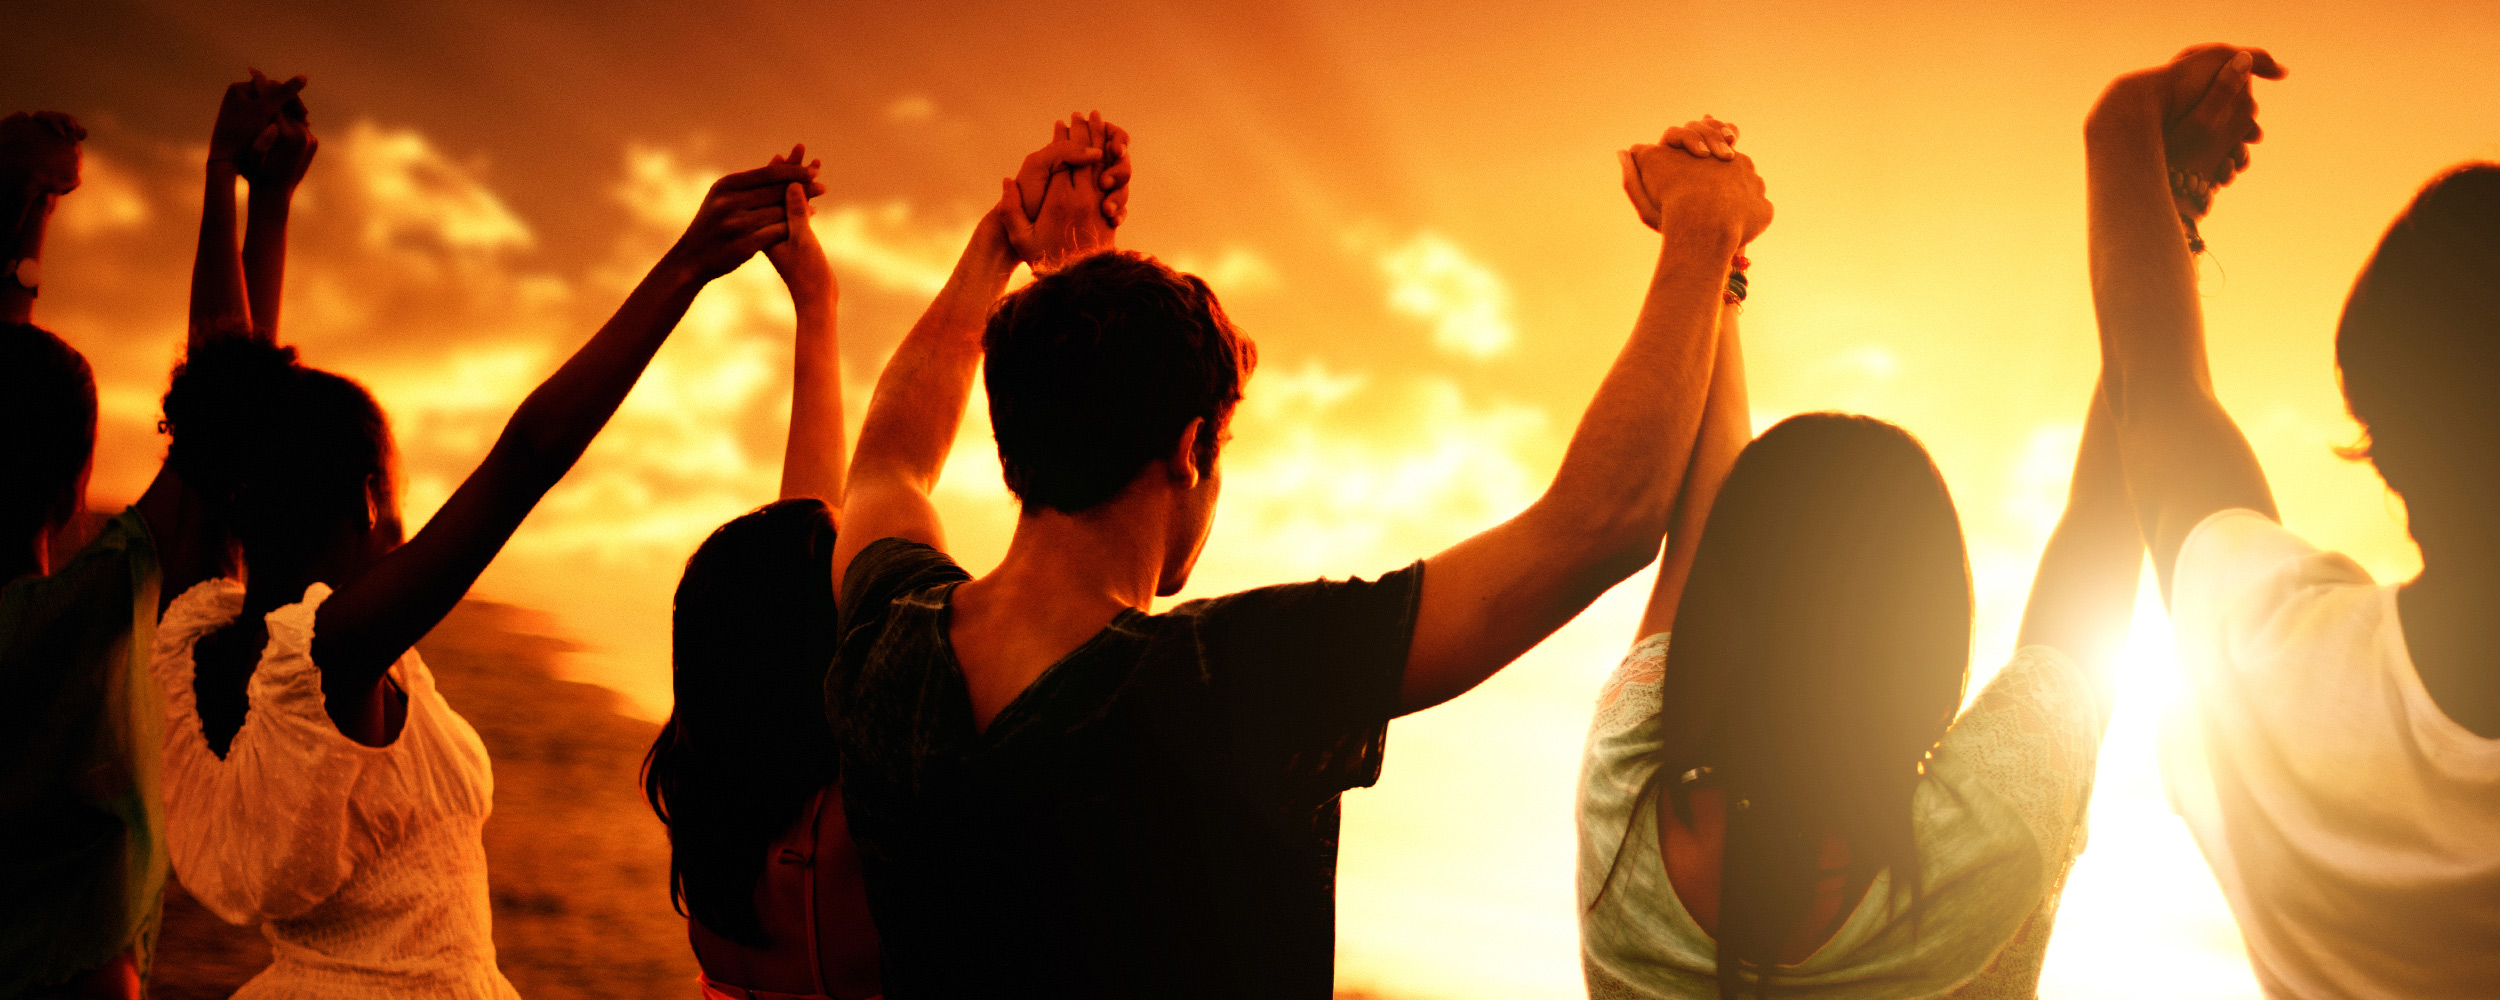 People Holding Hands.jpg